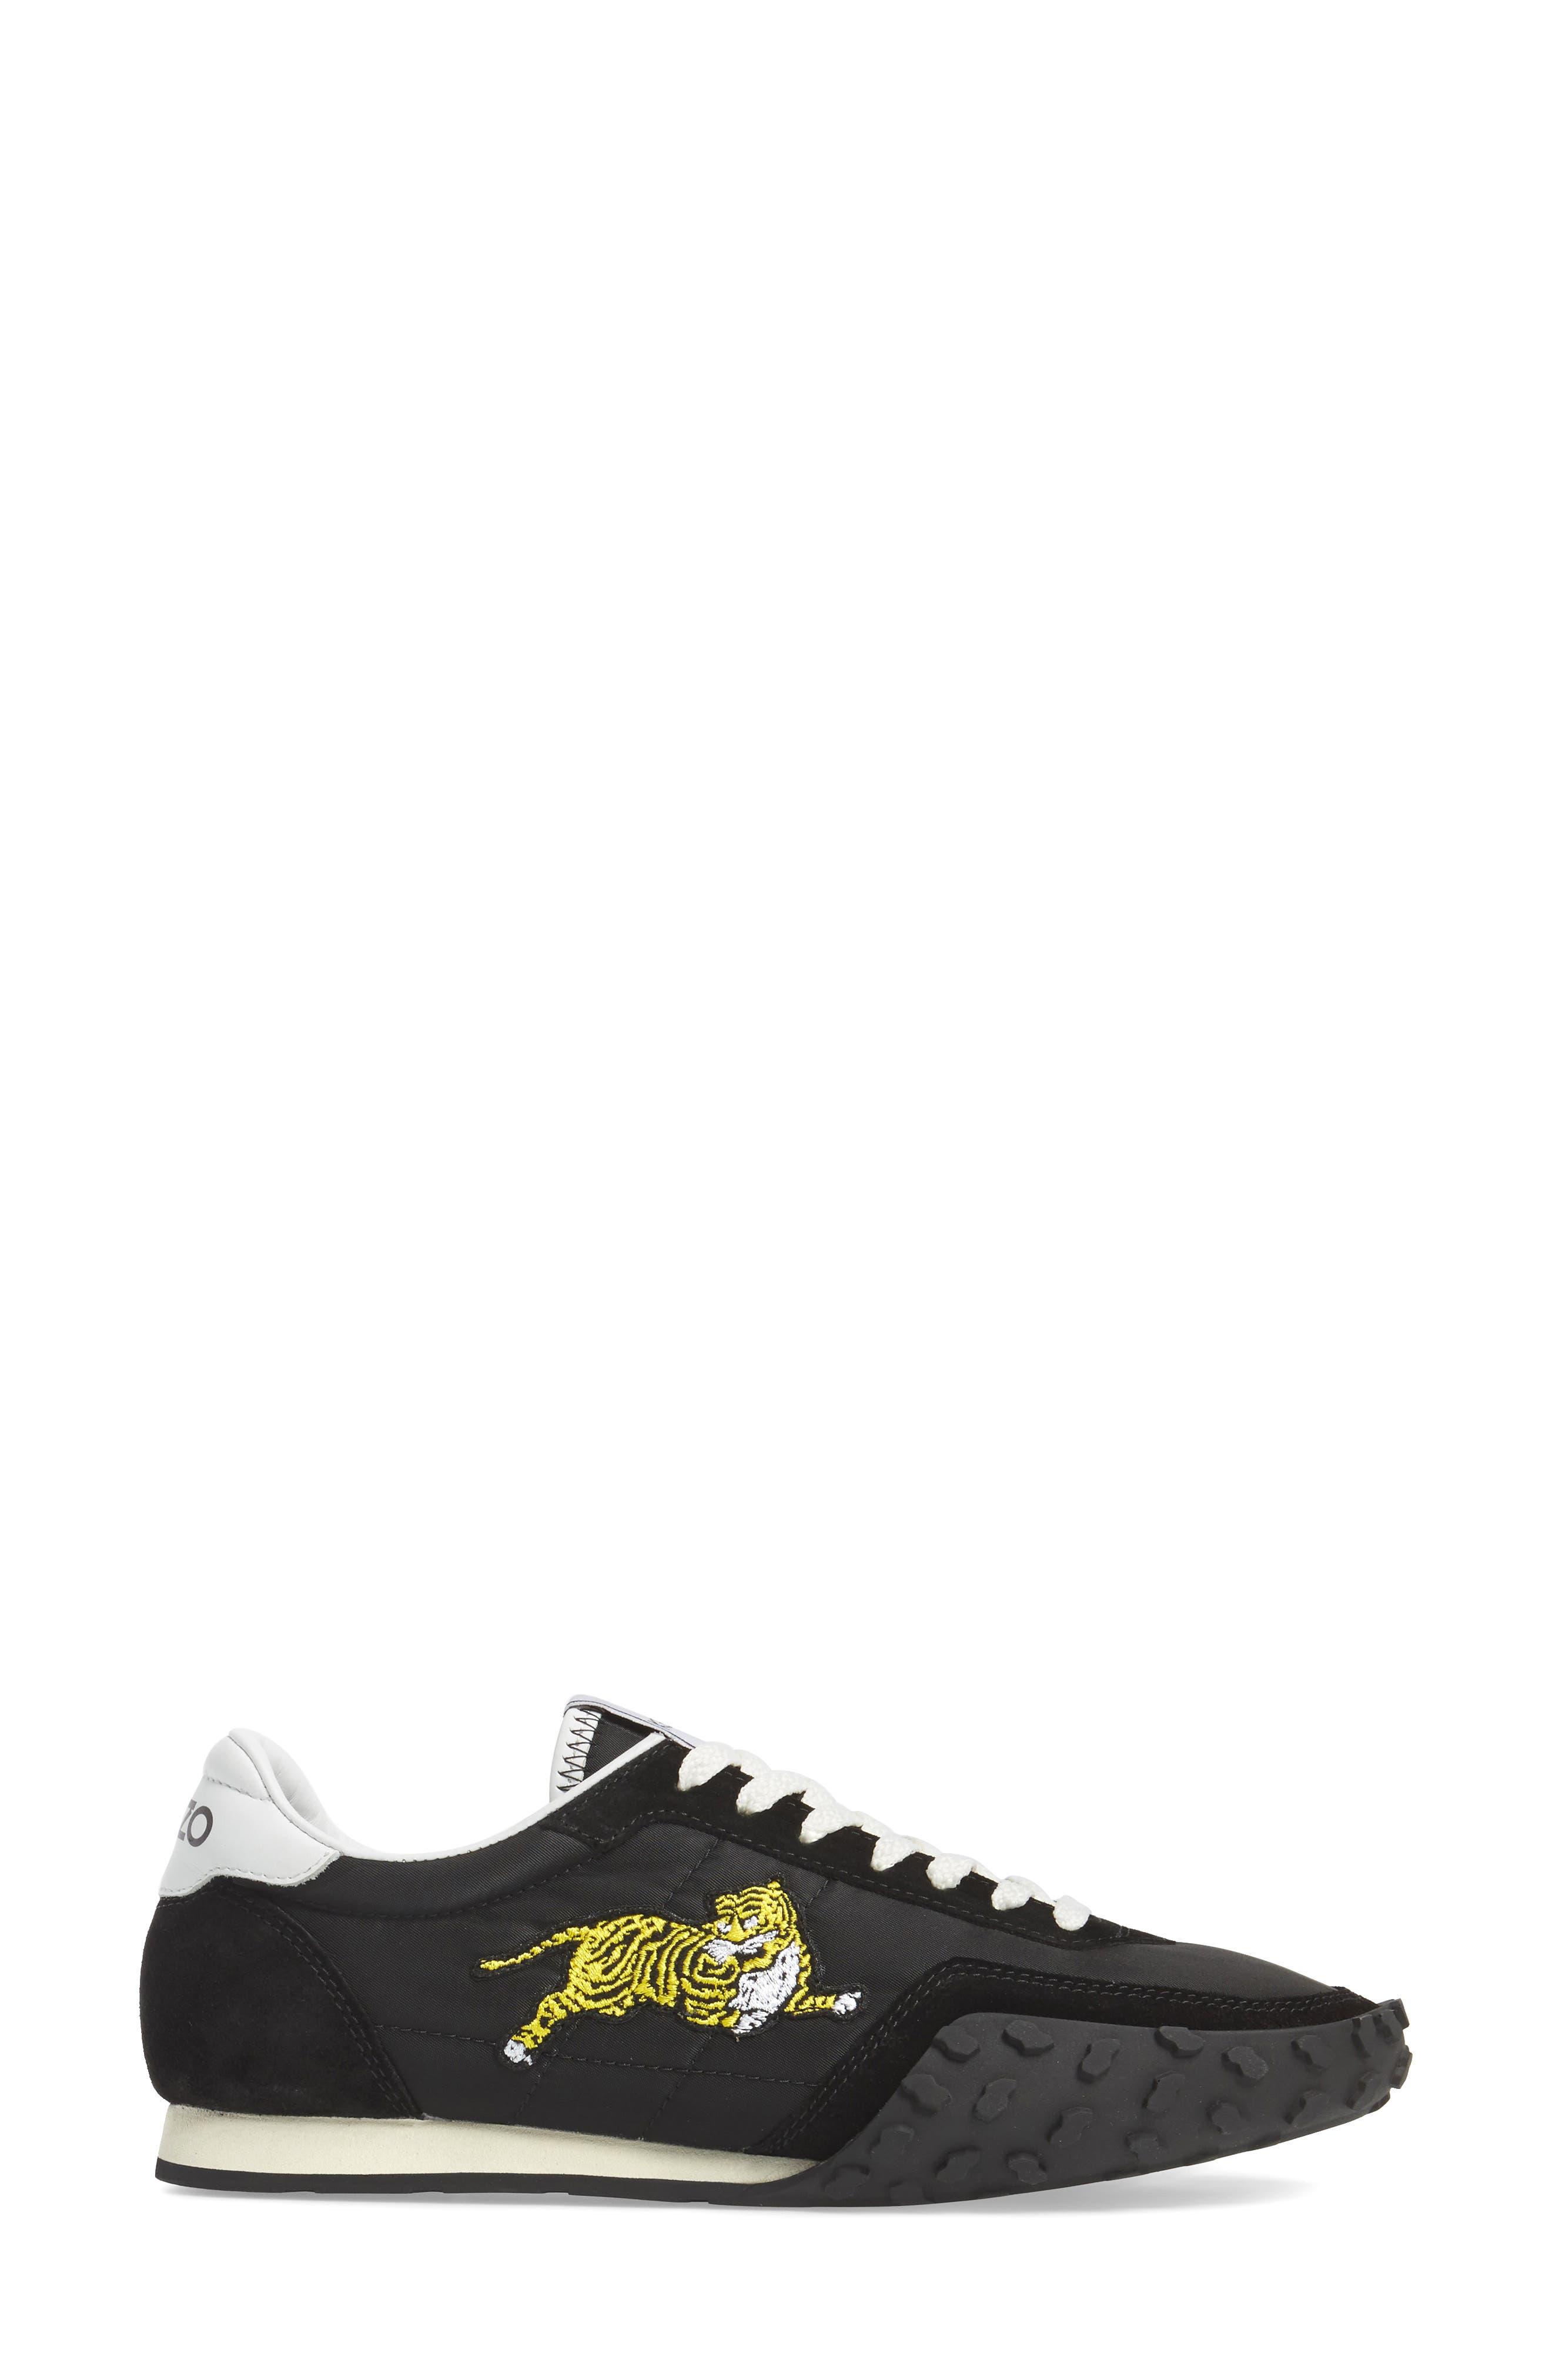 MOVE Sneaker,                             Alternate thumbnail 3, color,                             BLACK